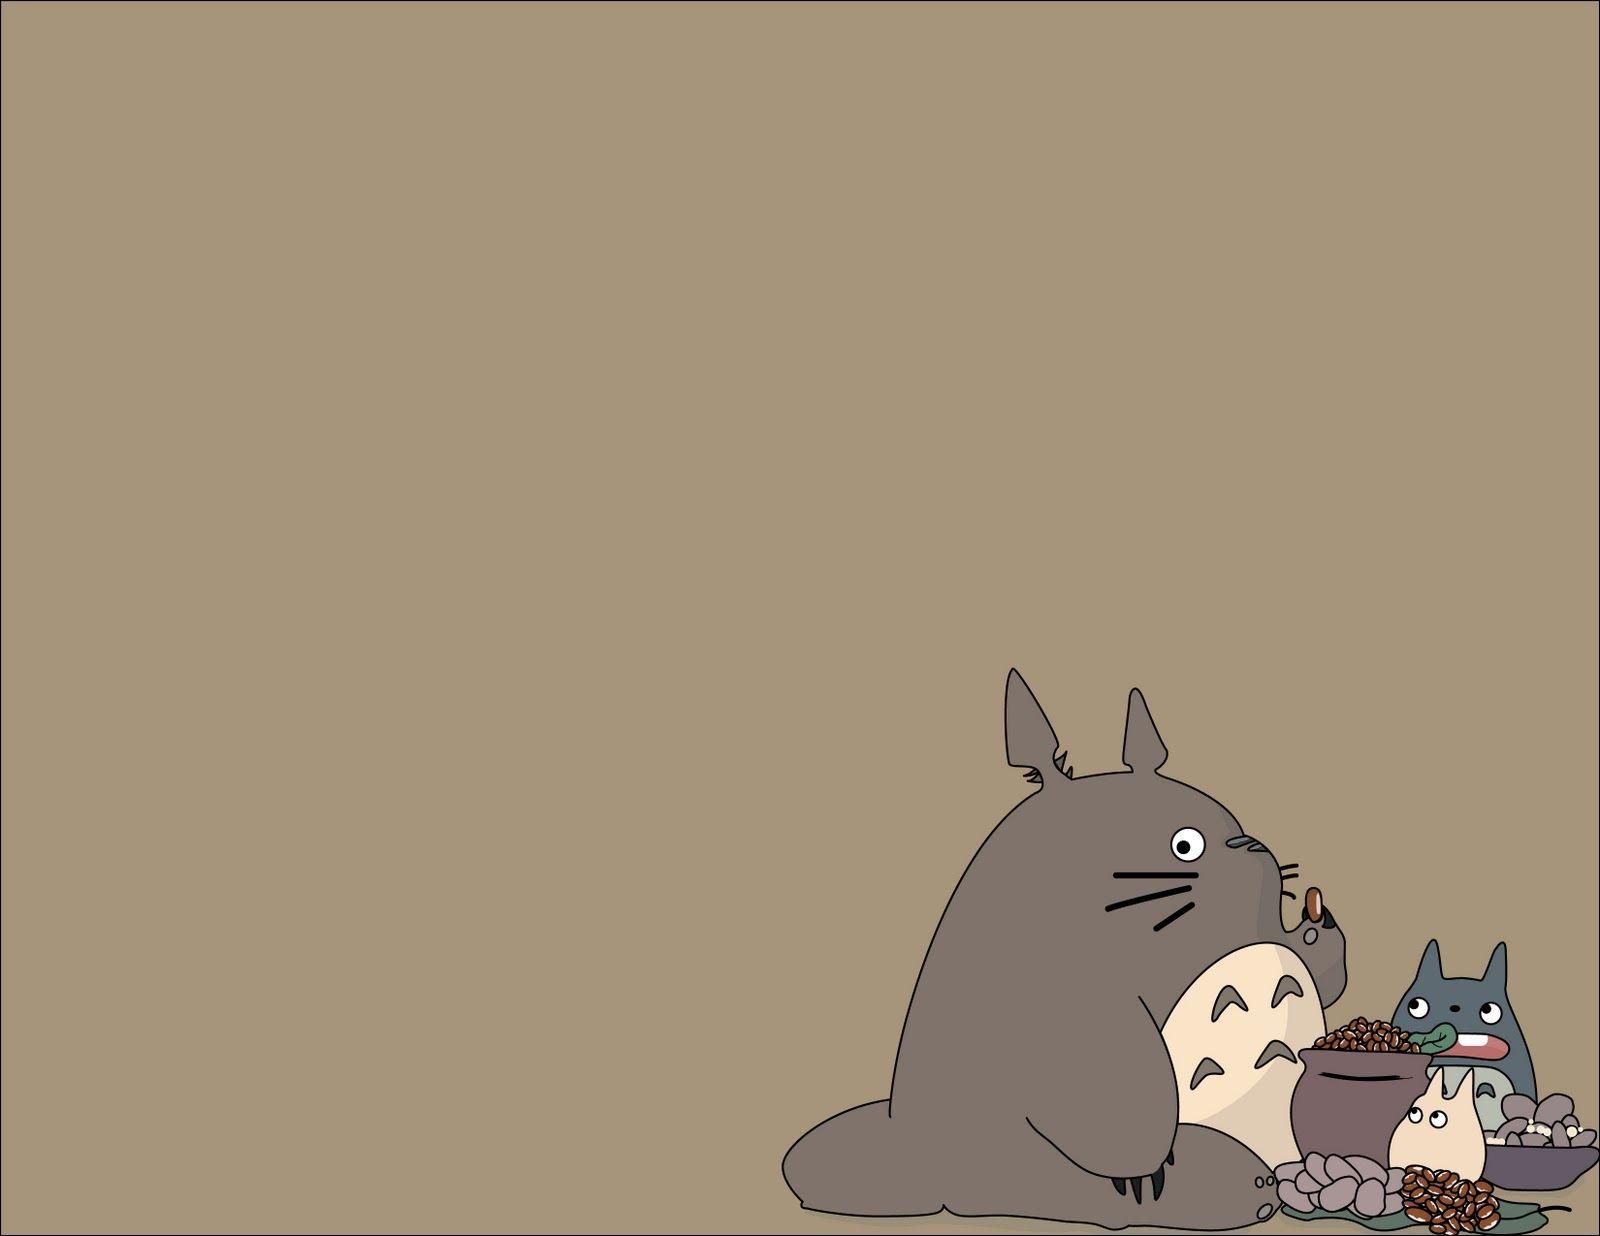 Wallpaper iphone totoro - Totoro Wallpaper